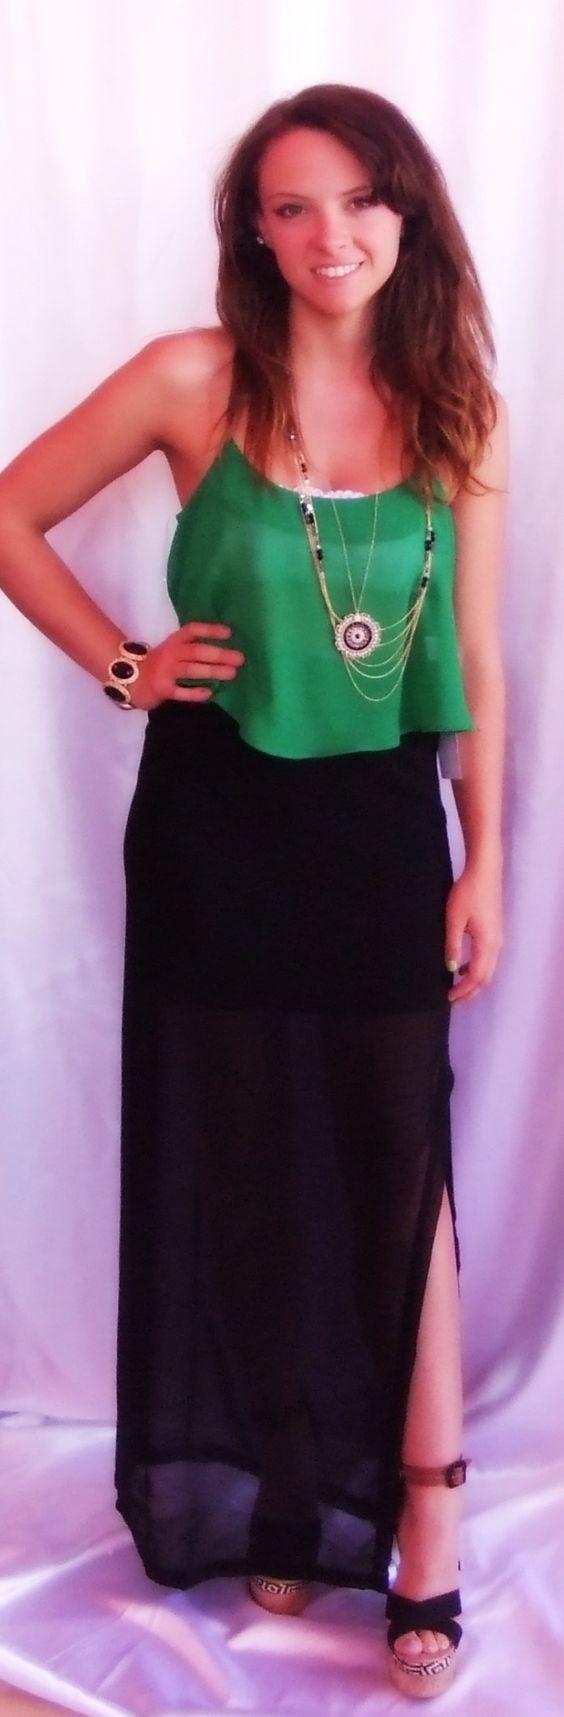 - Green Scalloped Top: $16.99  - Black Maxi Skirt: $34.99  (Sizes: S-L)  - Necklaces: $24.99 & $32.99  - Bracelet: $24.99  - Wedges: $49.99